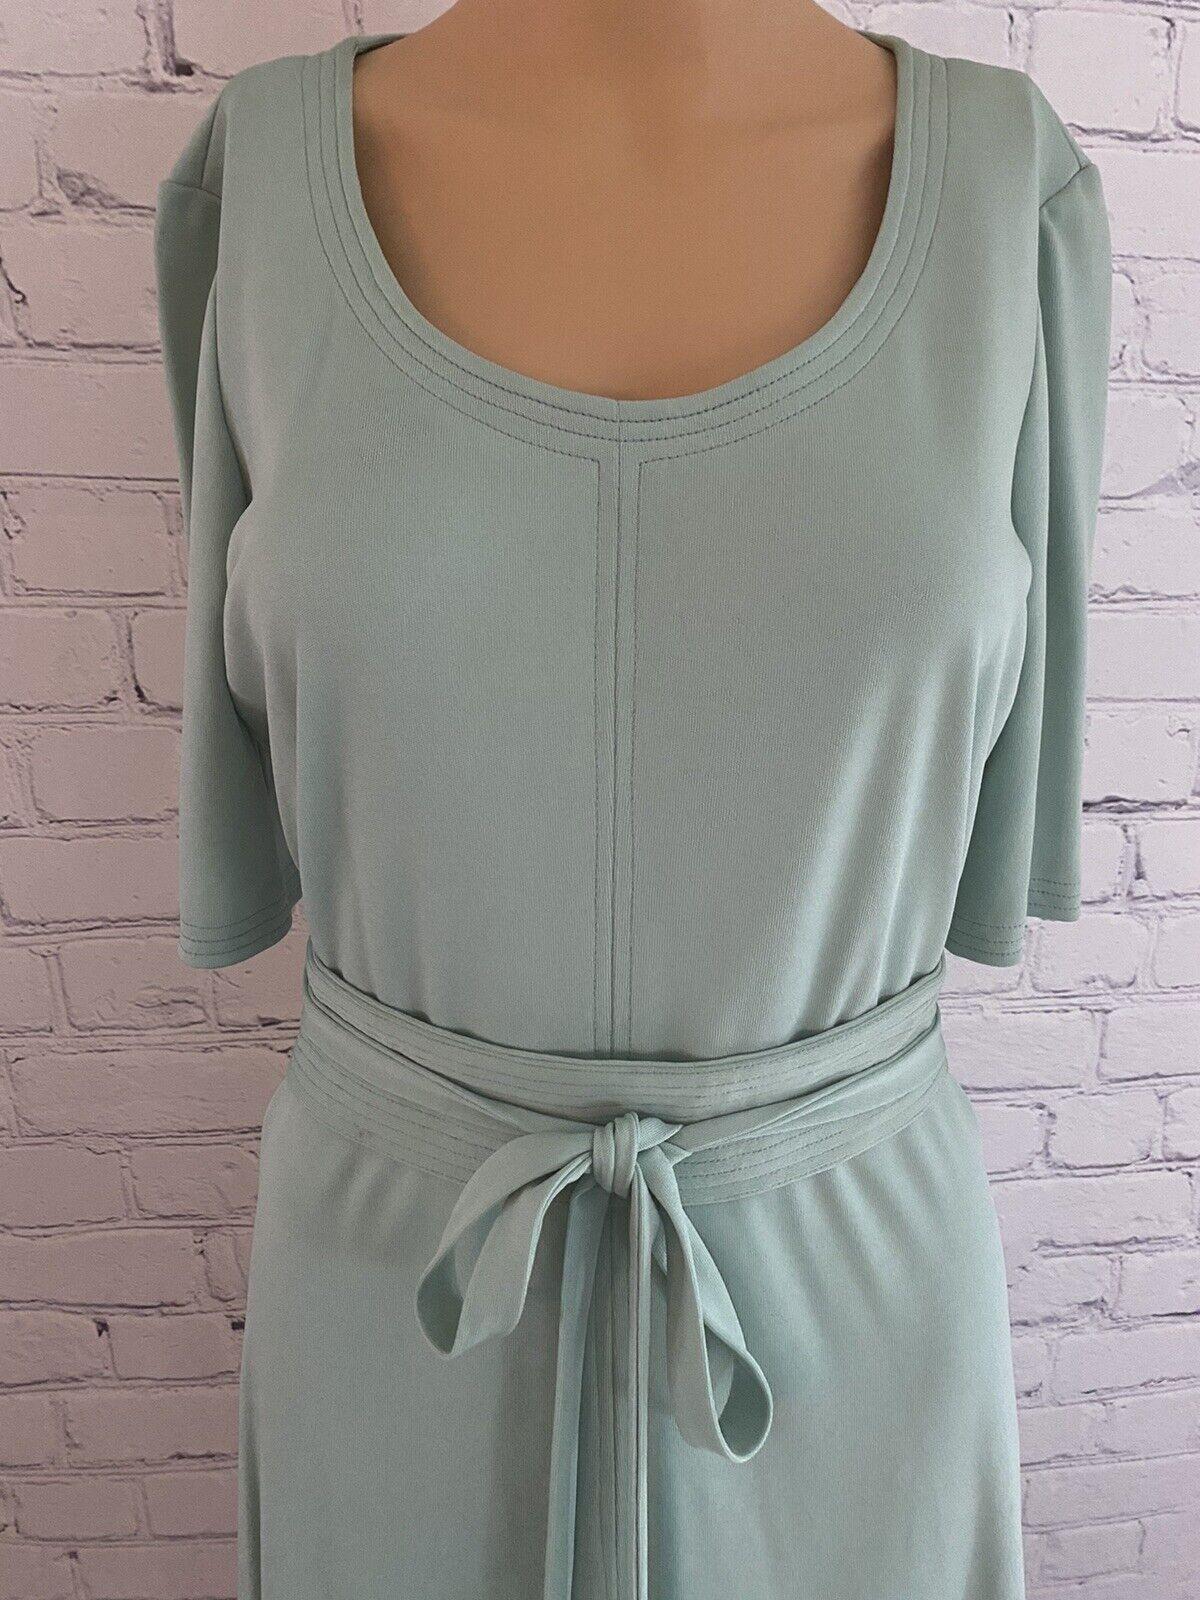 Vintage 70's Mint Green Disco/Secretary Dress - image 2